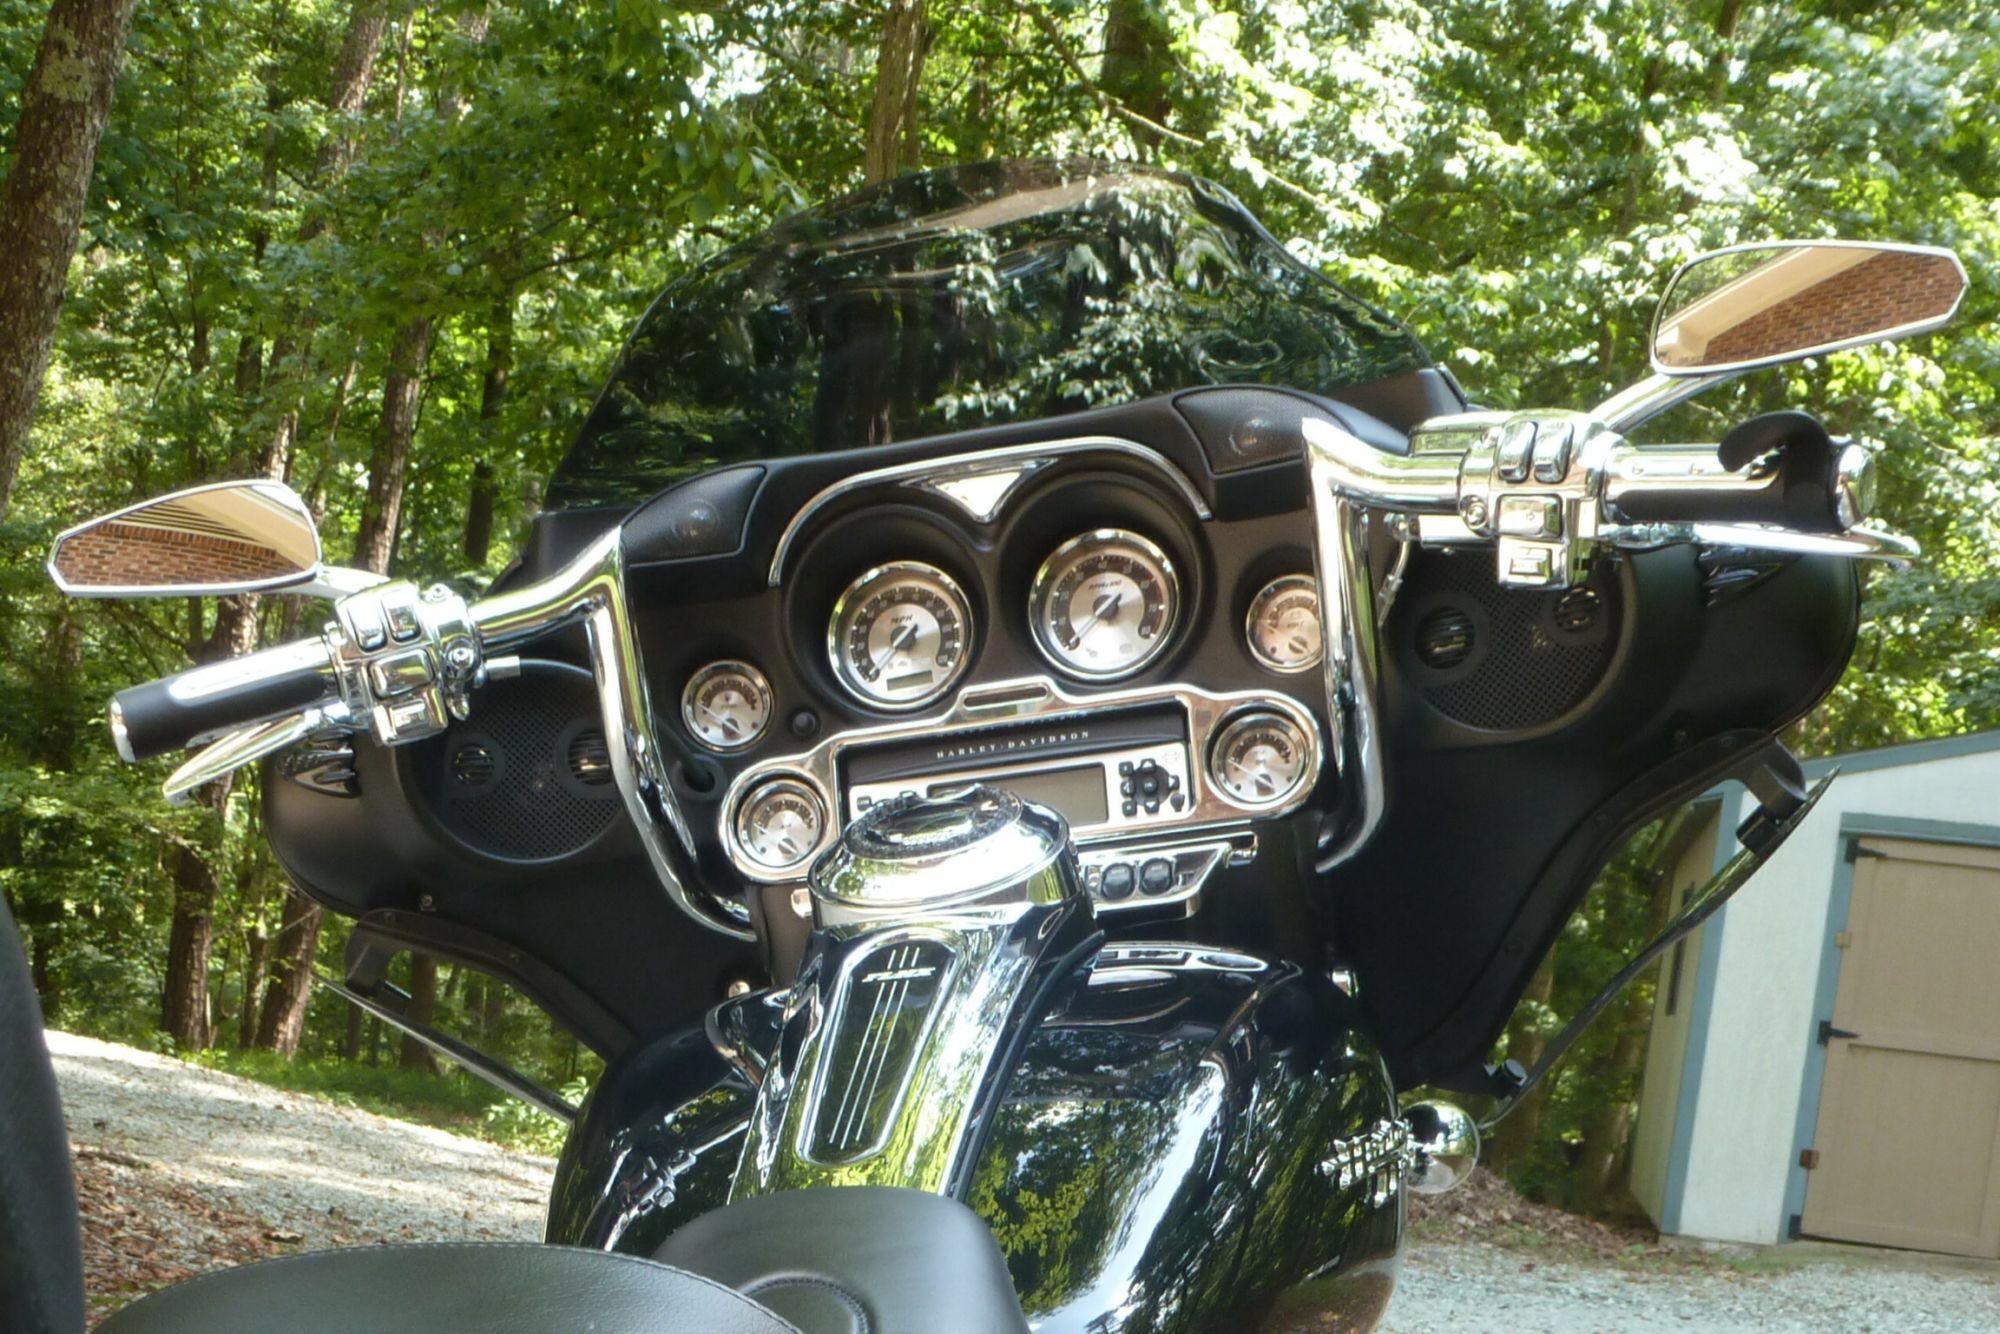 Flhx With 8 Paul Yaffe Monkey Bars Monkey Bars Street Glide Harley Davidson